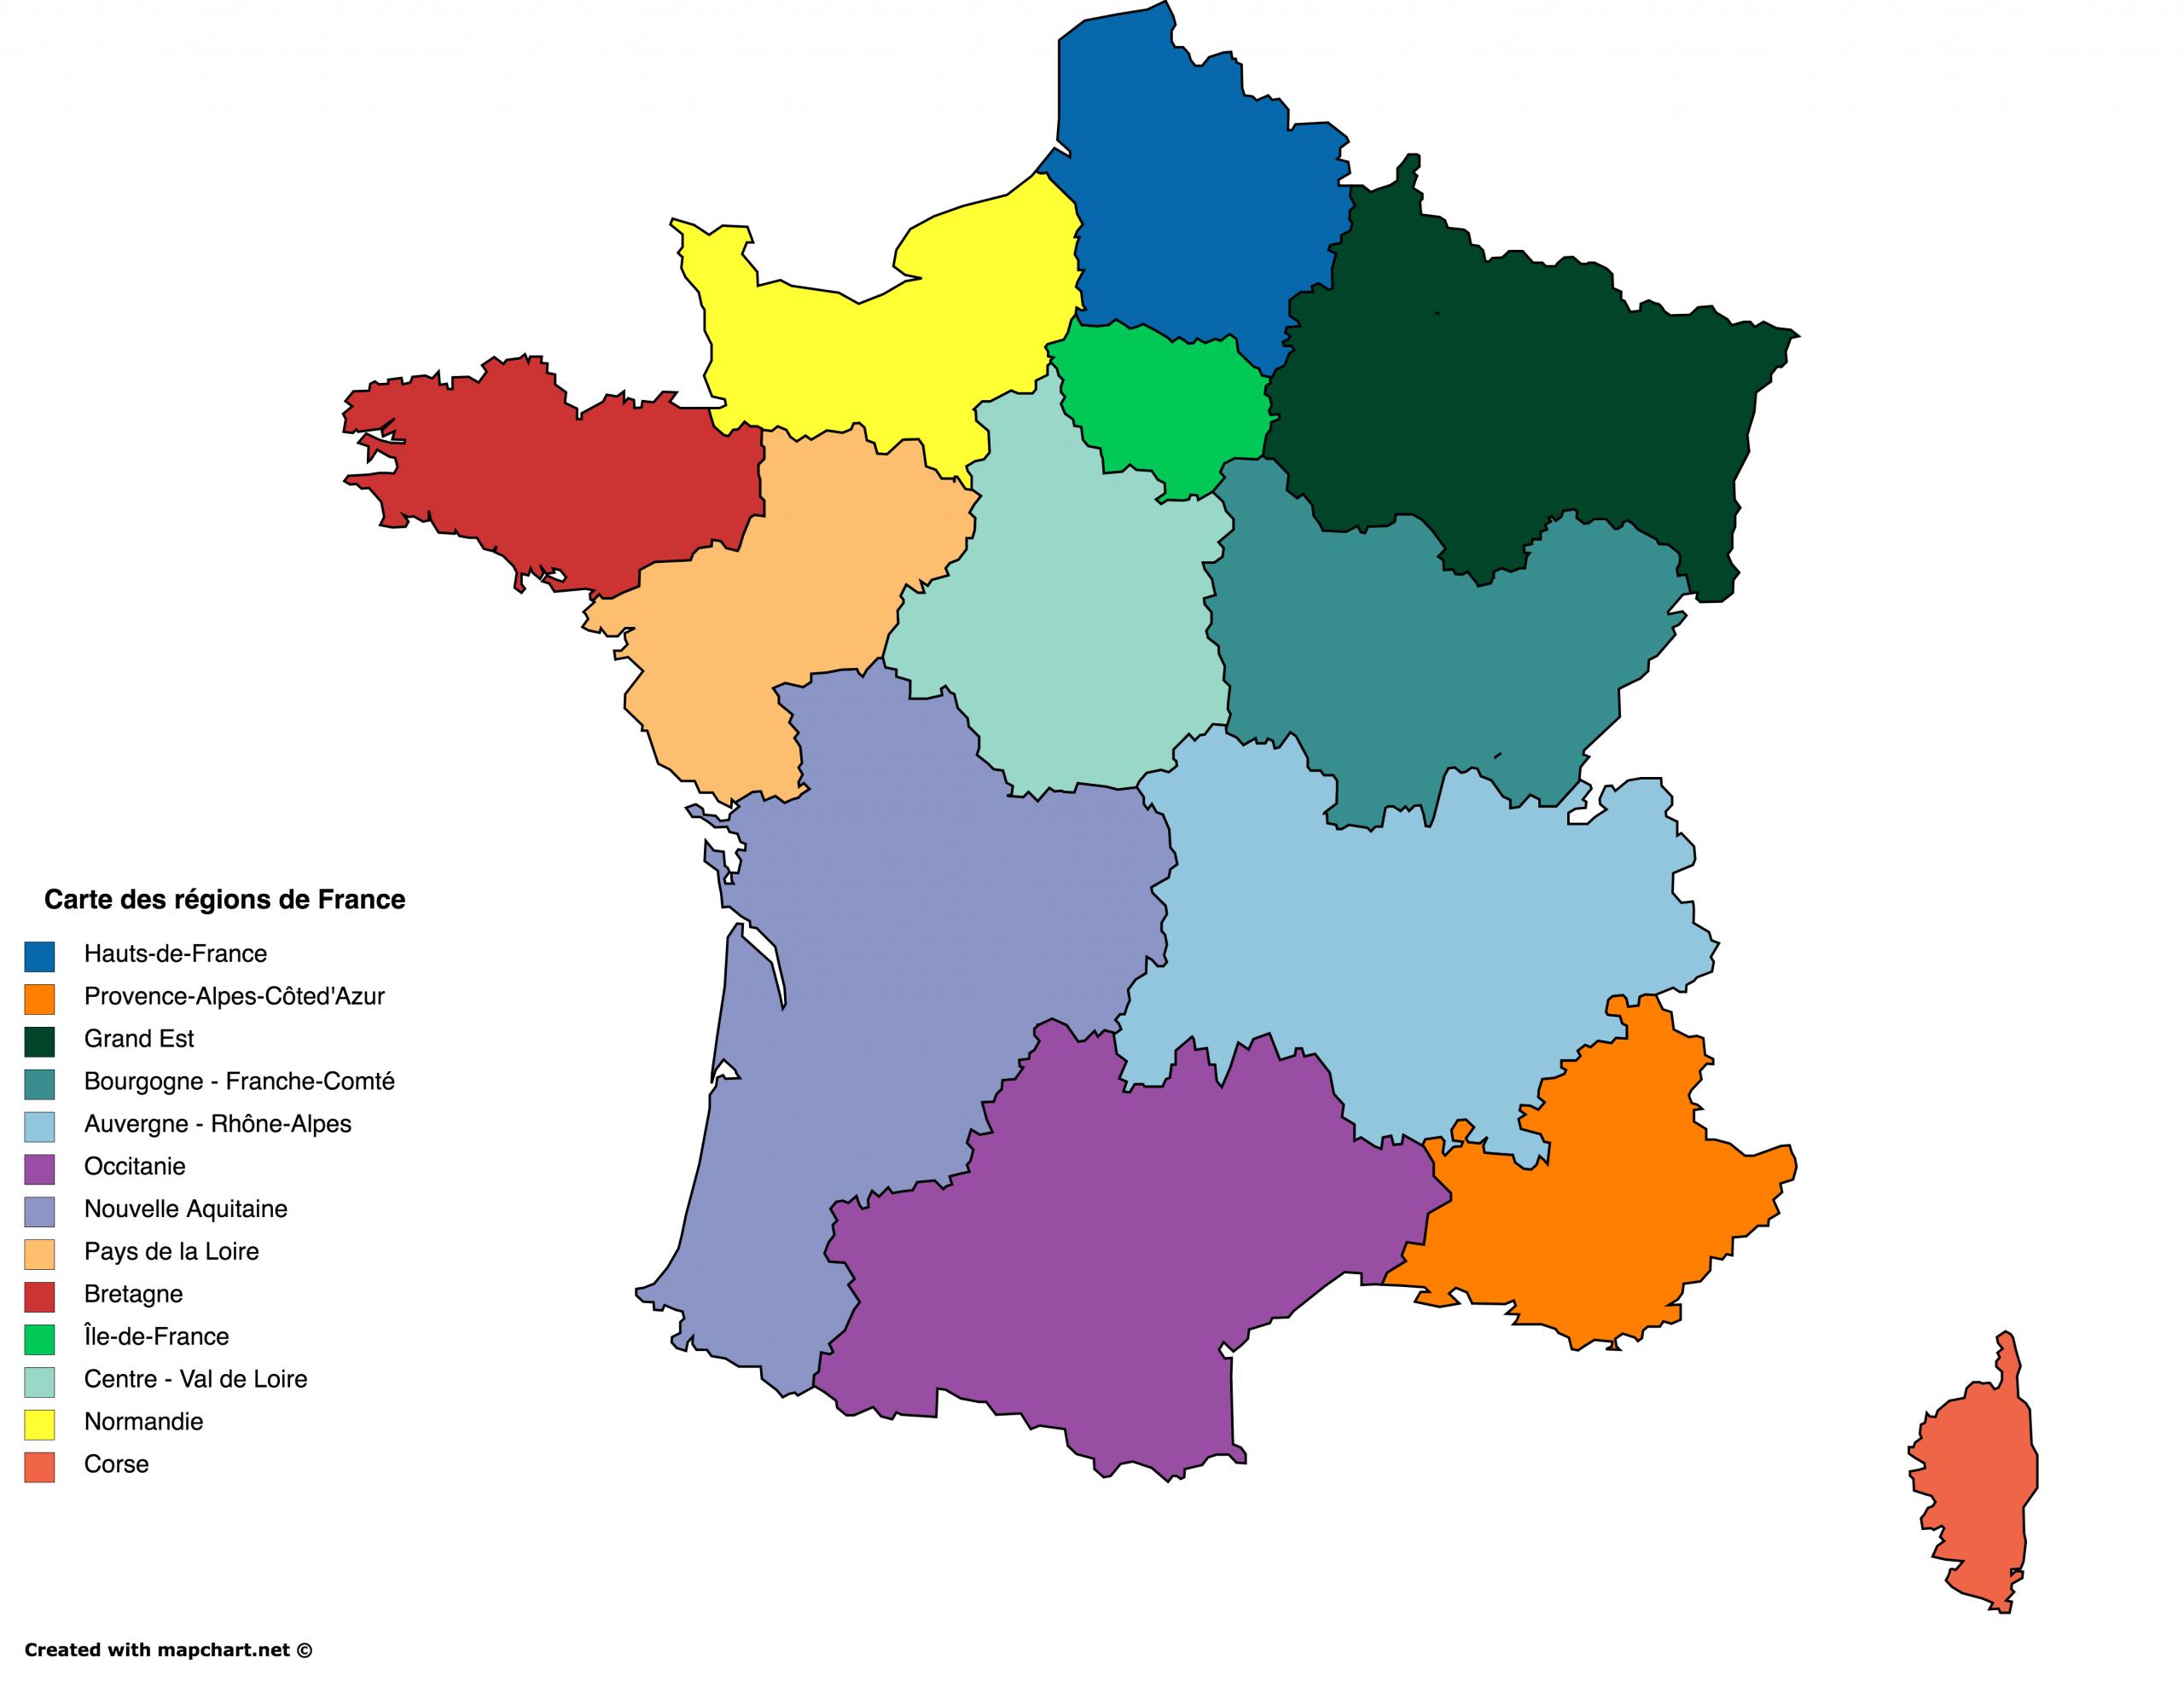 Adfb1 Carte France Region | Wiring Library destiné Carte Ile De France Vierge